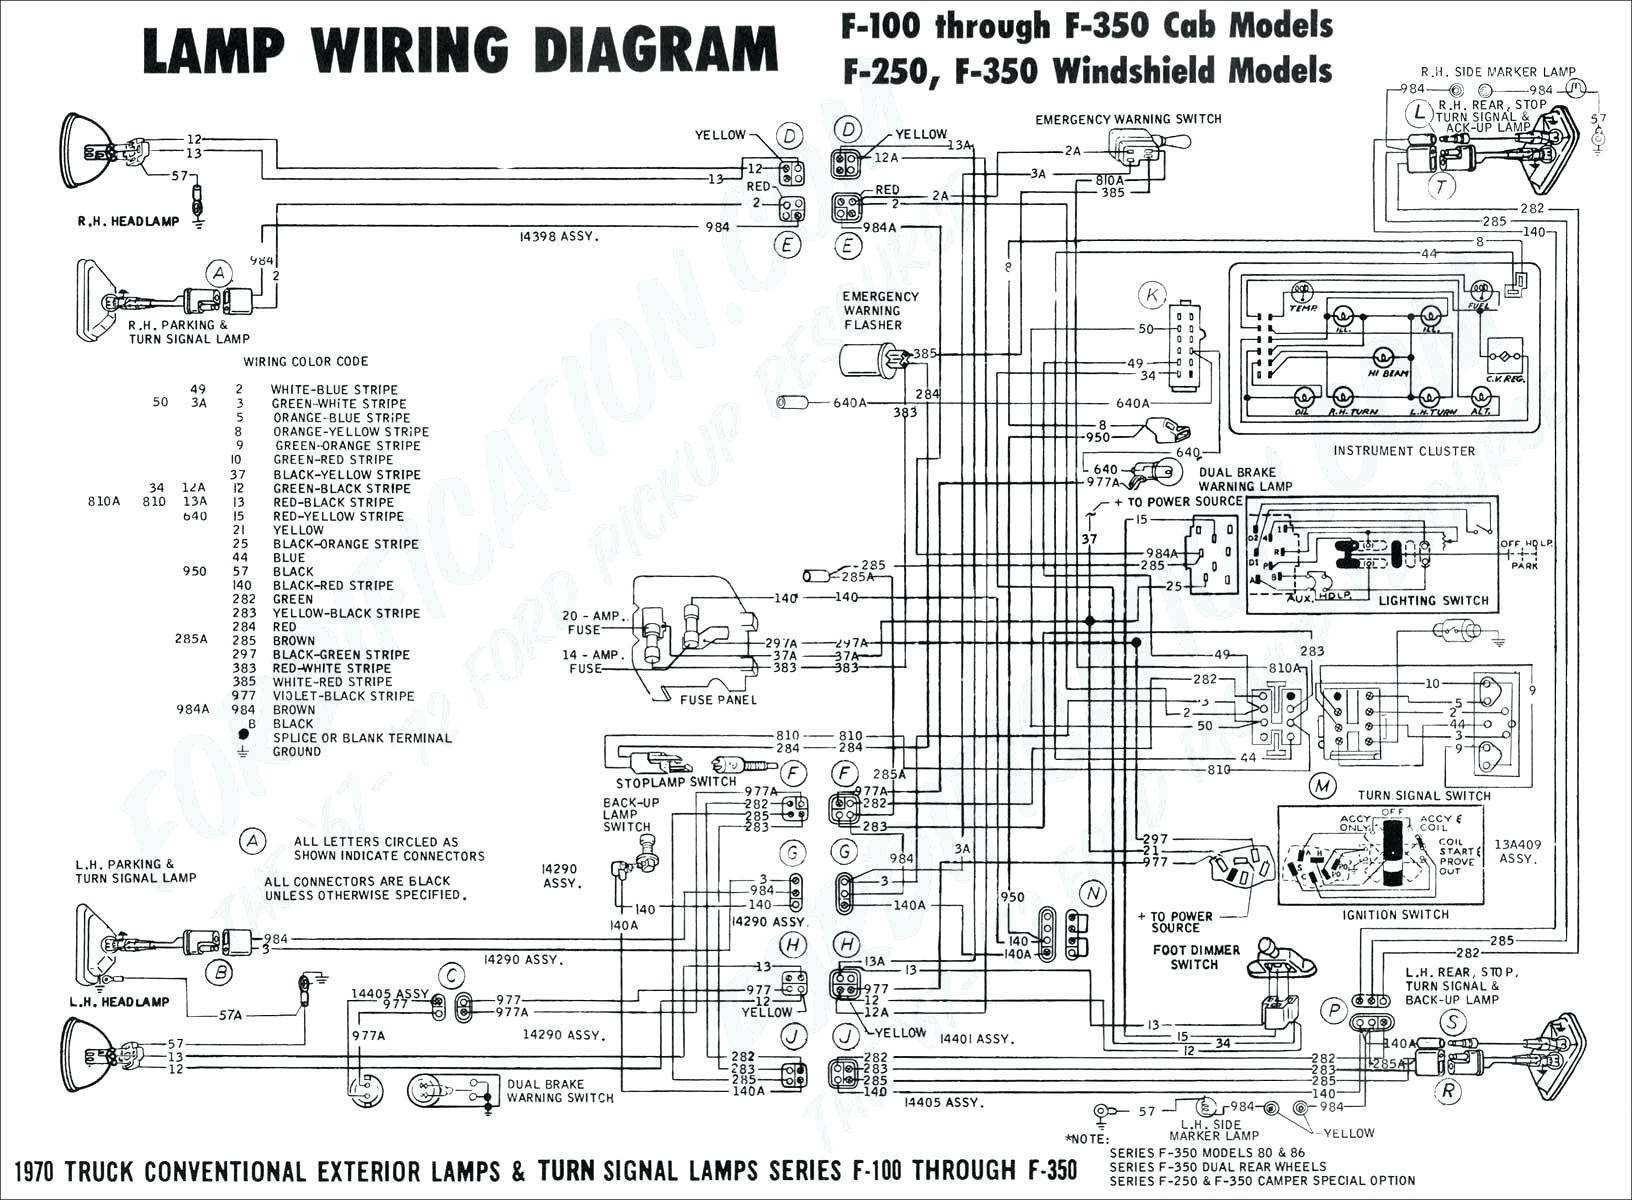 1999 Dodge Ram Tail Light Wiring Diagram